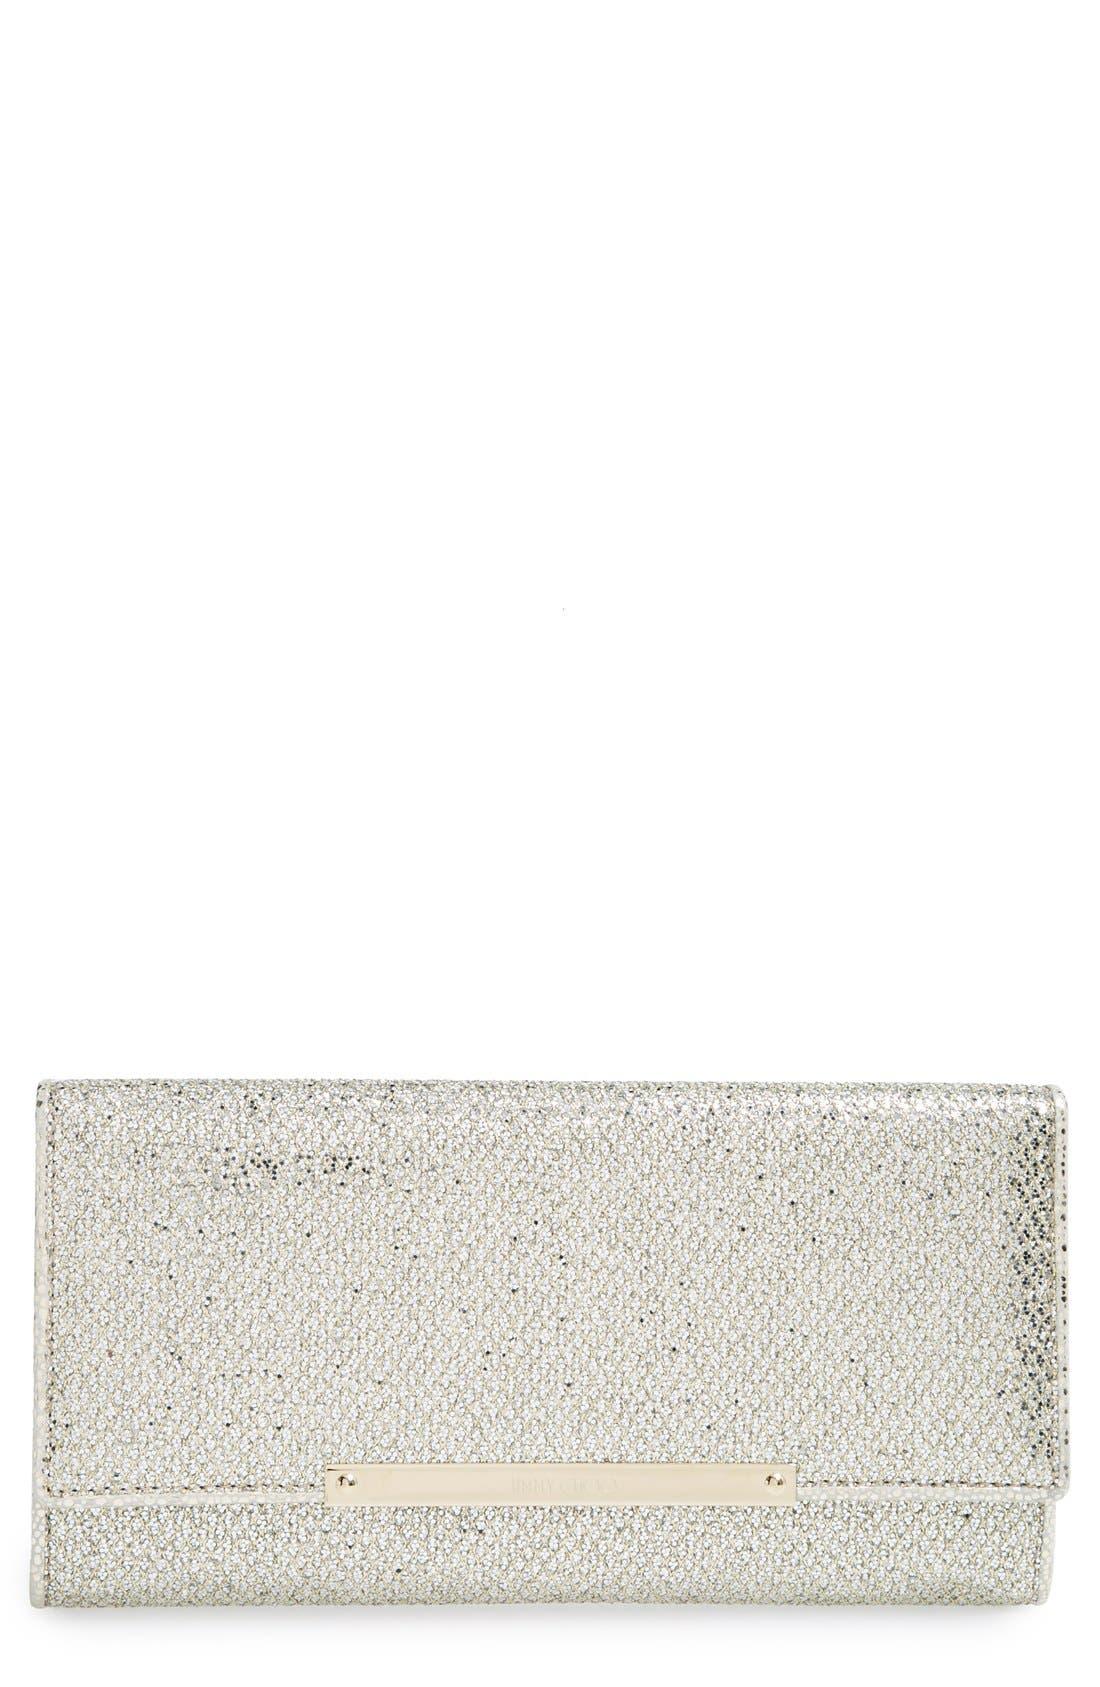 Alternate Image 1 Selected - Jimmy Choo 'Marilyn' Glitter Leather Clutch